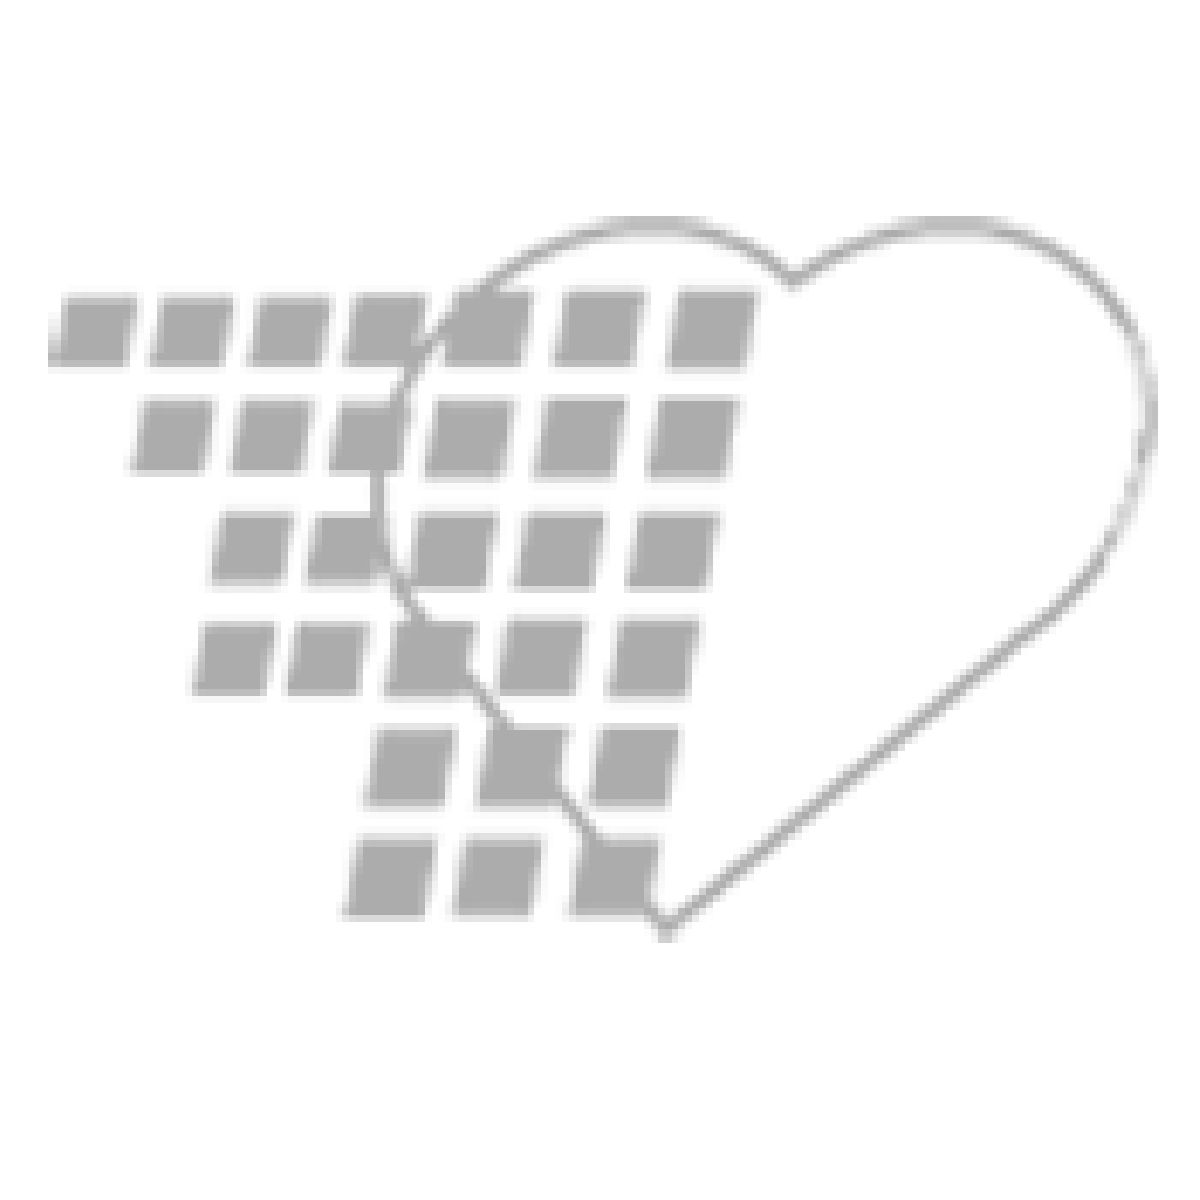 06-93-0317 - Demo Dose® Long Term Lipitr 10 mg Medication Pack